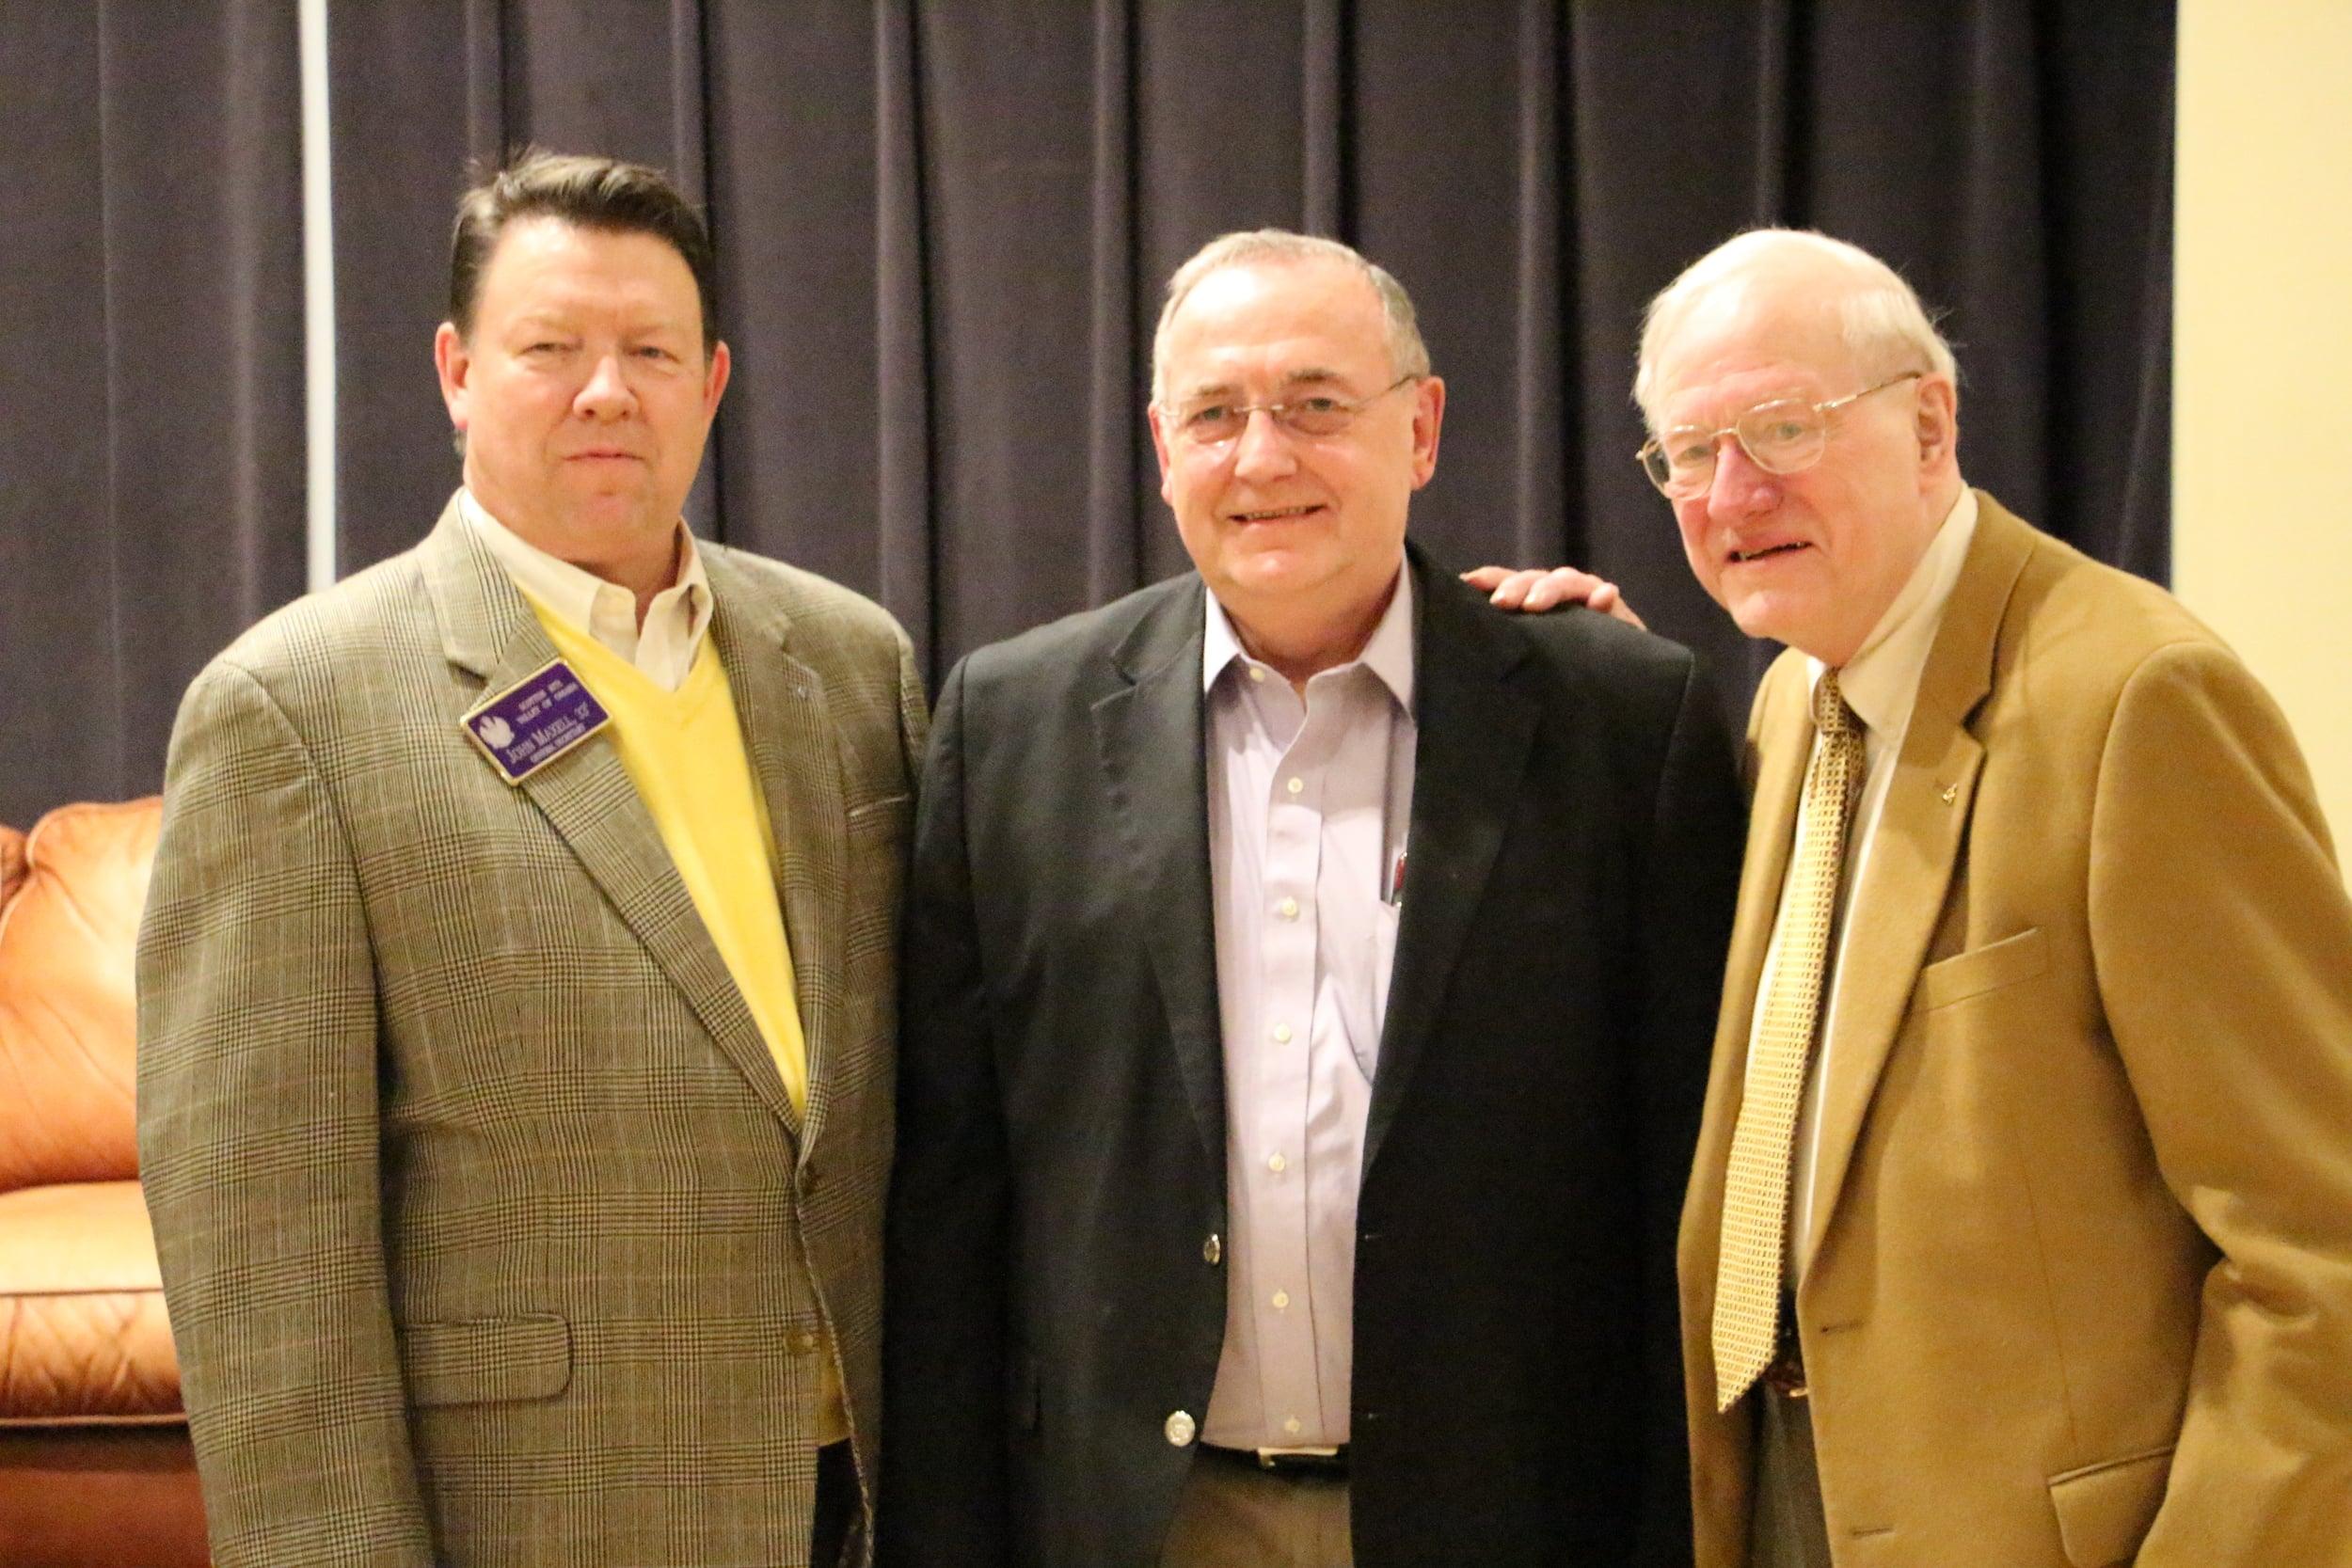 Three generations of General Secretaries: John Maxell, 33° (2016-), Curt Edic, 33° (1999-2015), and Jim Erixon, 33° (1996-1999)